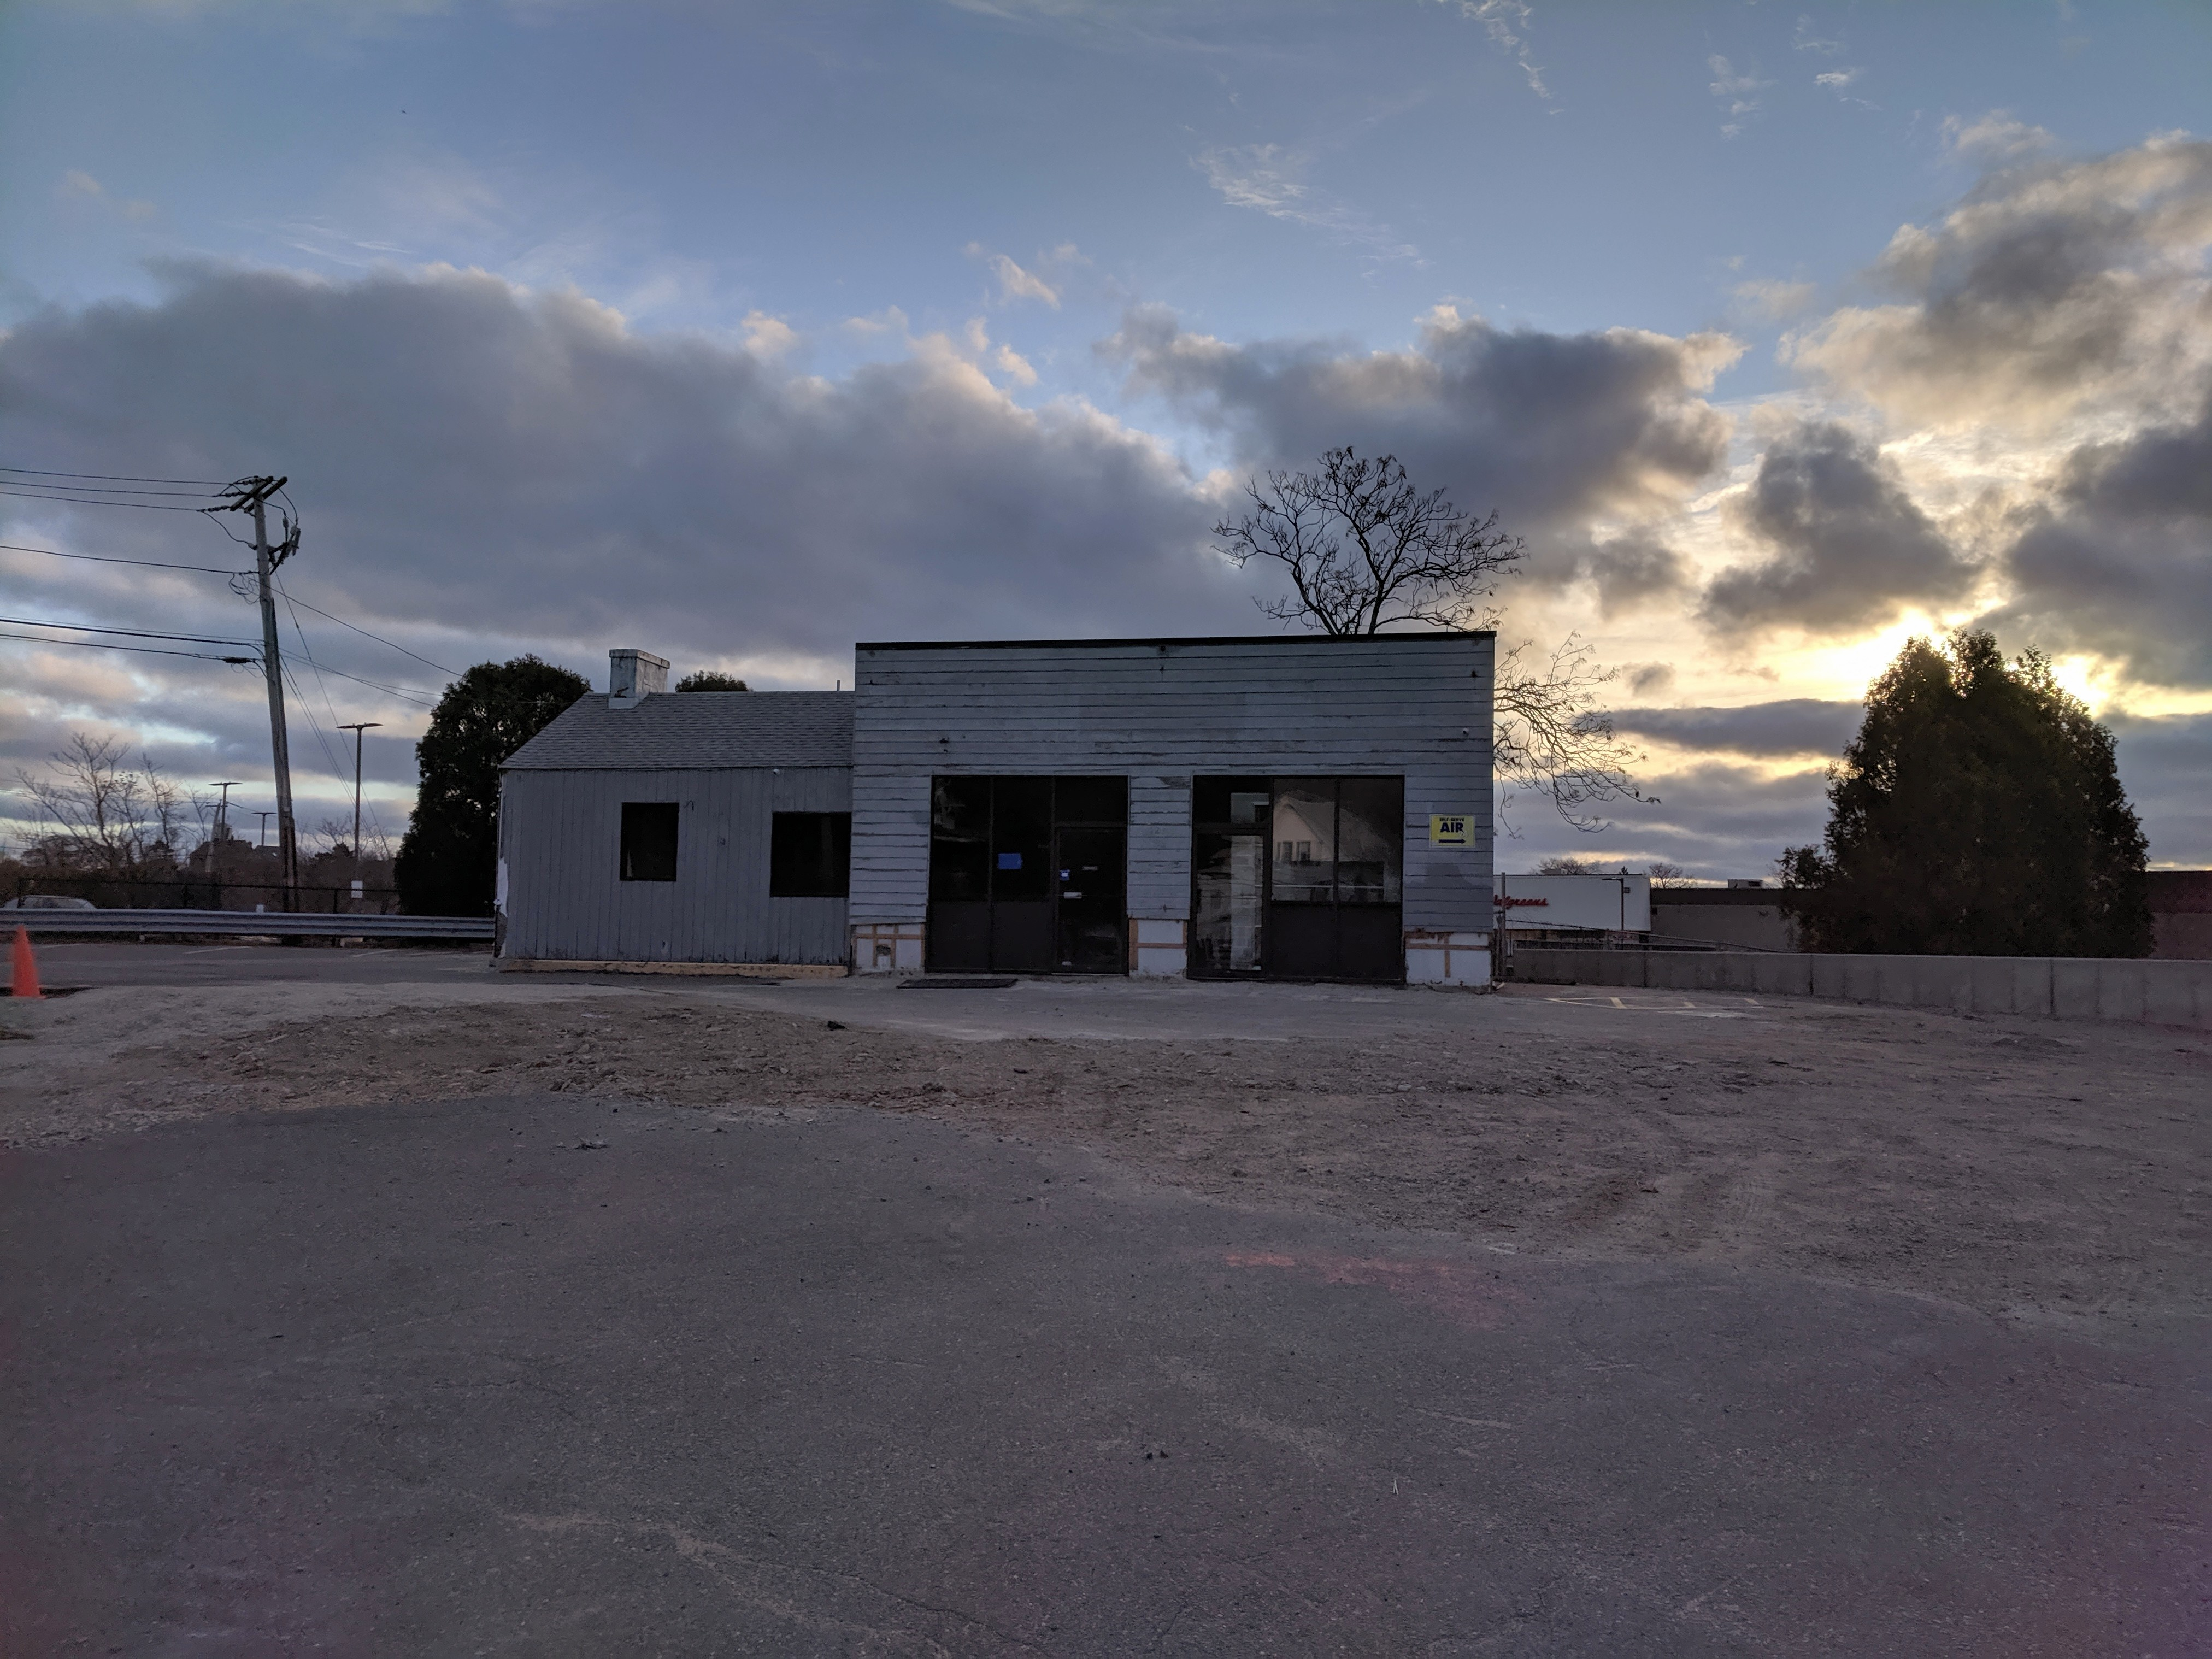 construction status November 2019 for123 Eastern Avenue in Gloucester Mass. Enterprise car rental coming_20191117_©c ryan.jpg